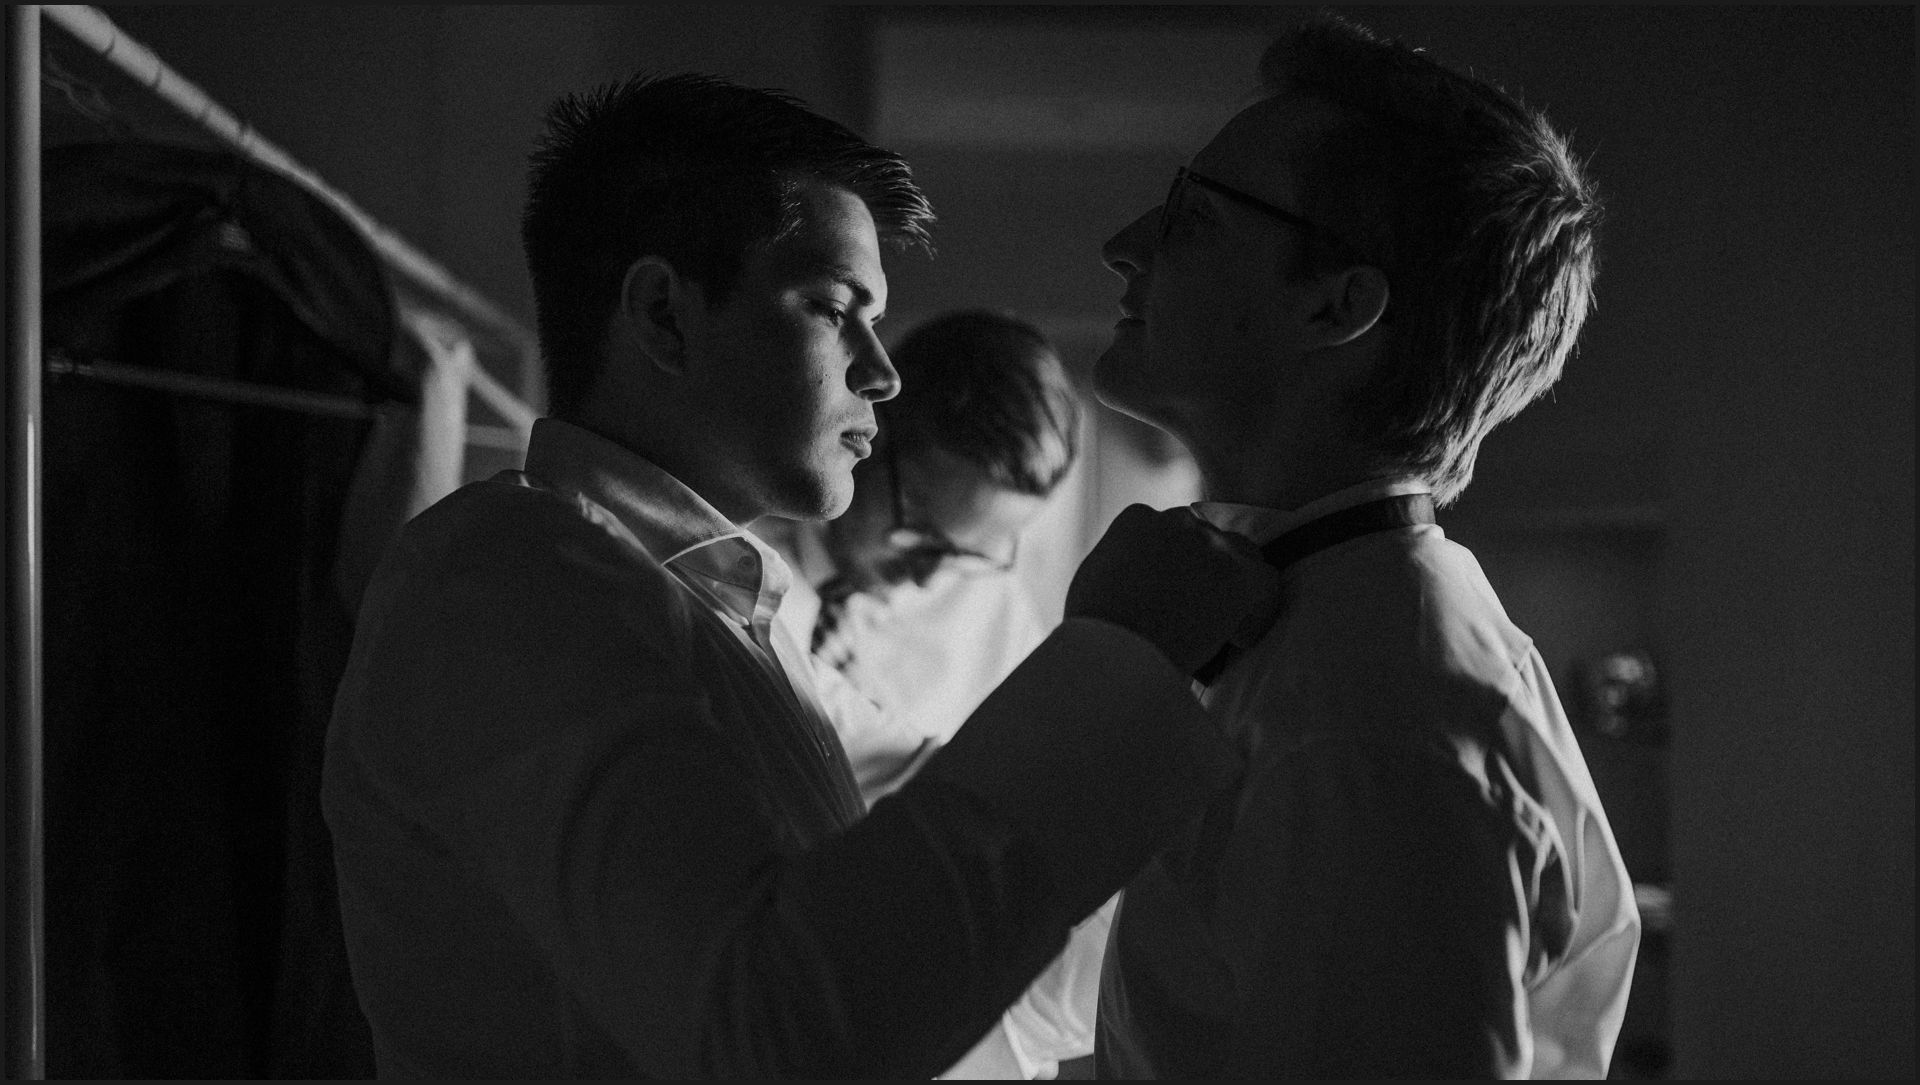 black and white, groom, preparation, skirt, umbria, nikis resort, friend